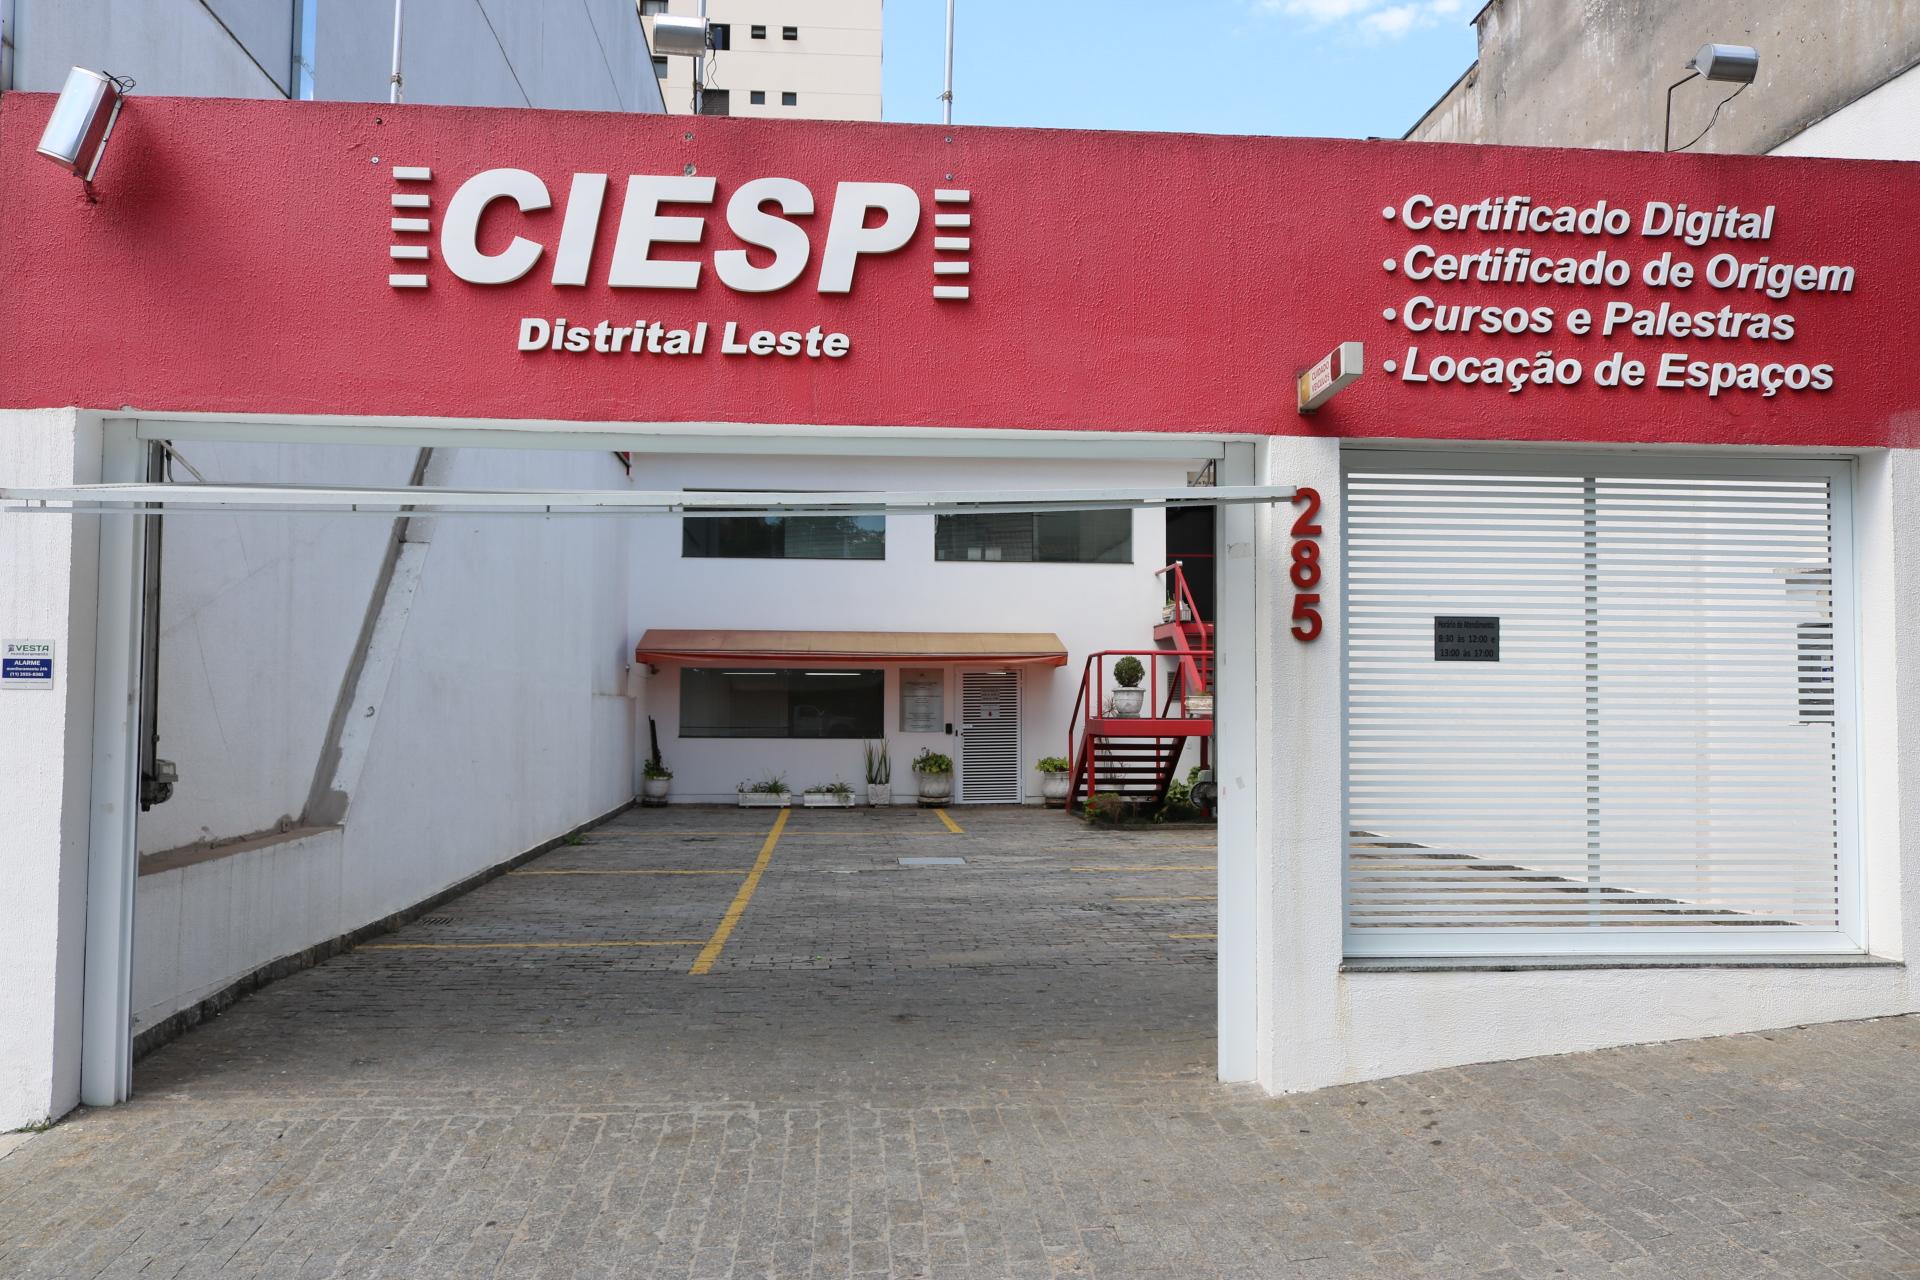 CIESP Leste